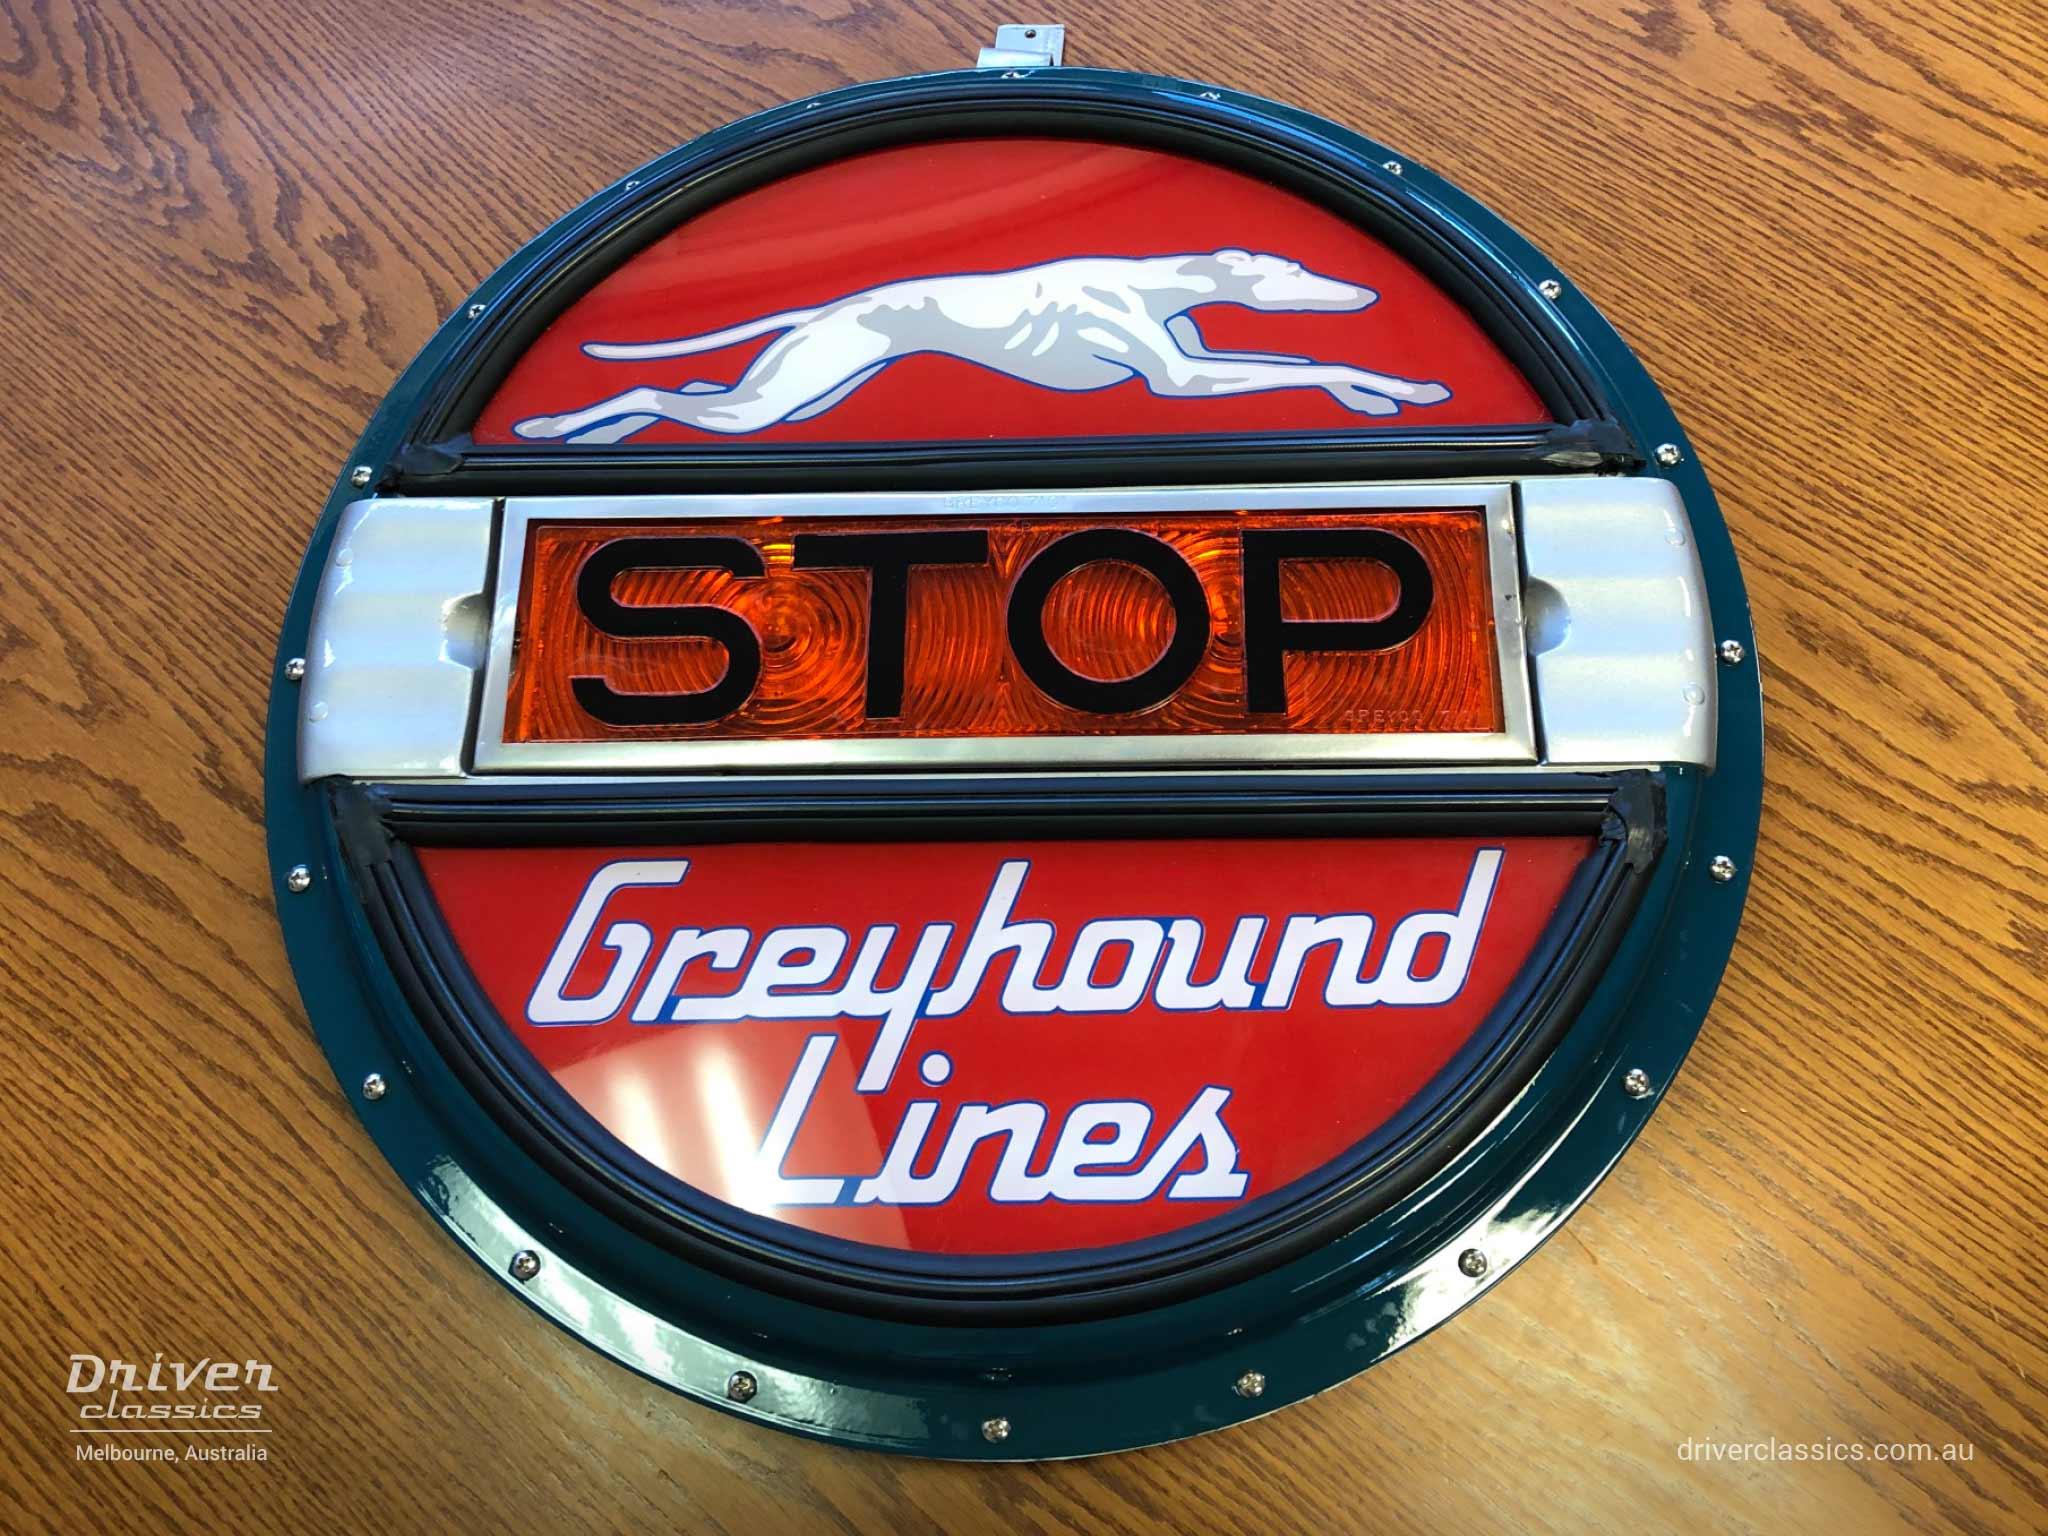 Restored original Greyhound drum head for bus rear, Melbourne, VIC July 2019